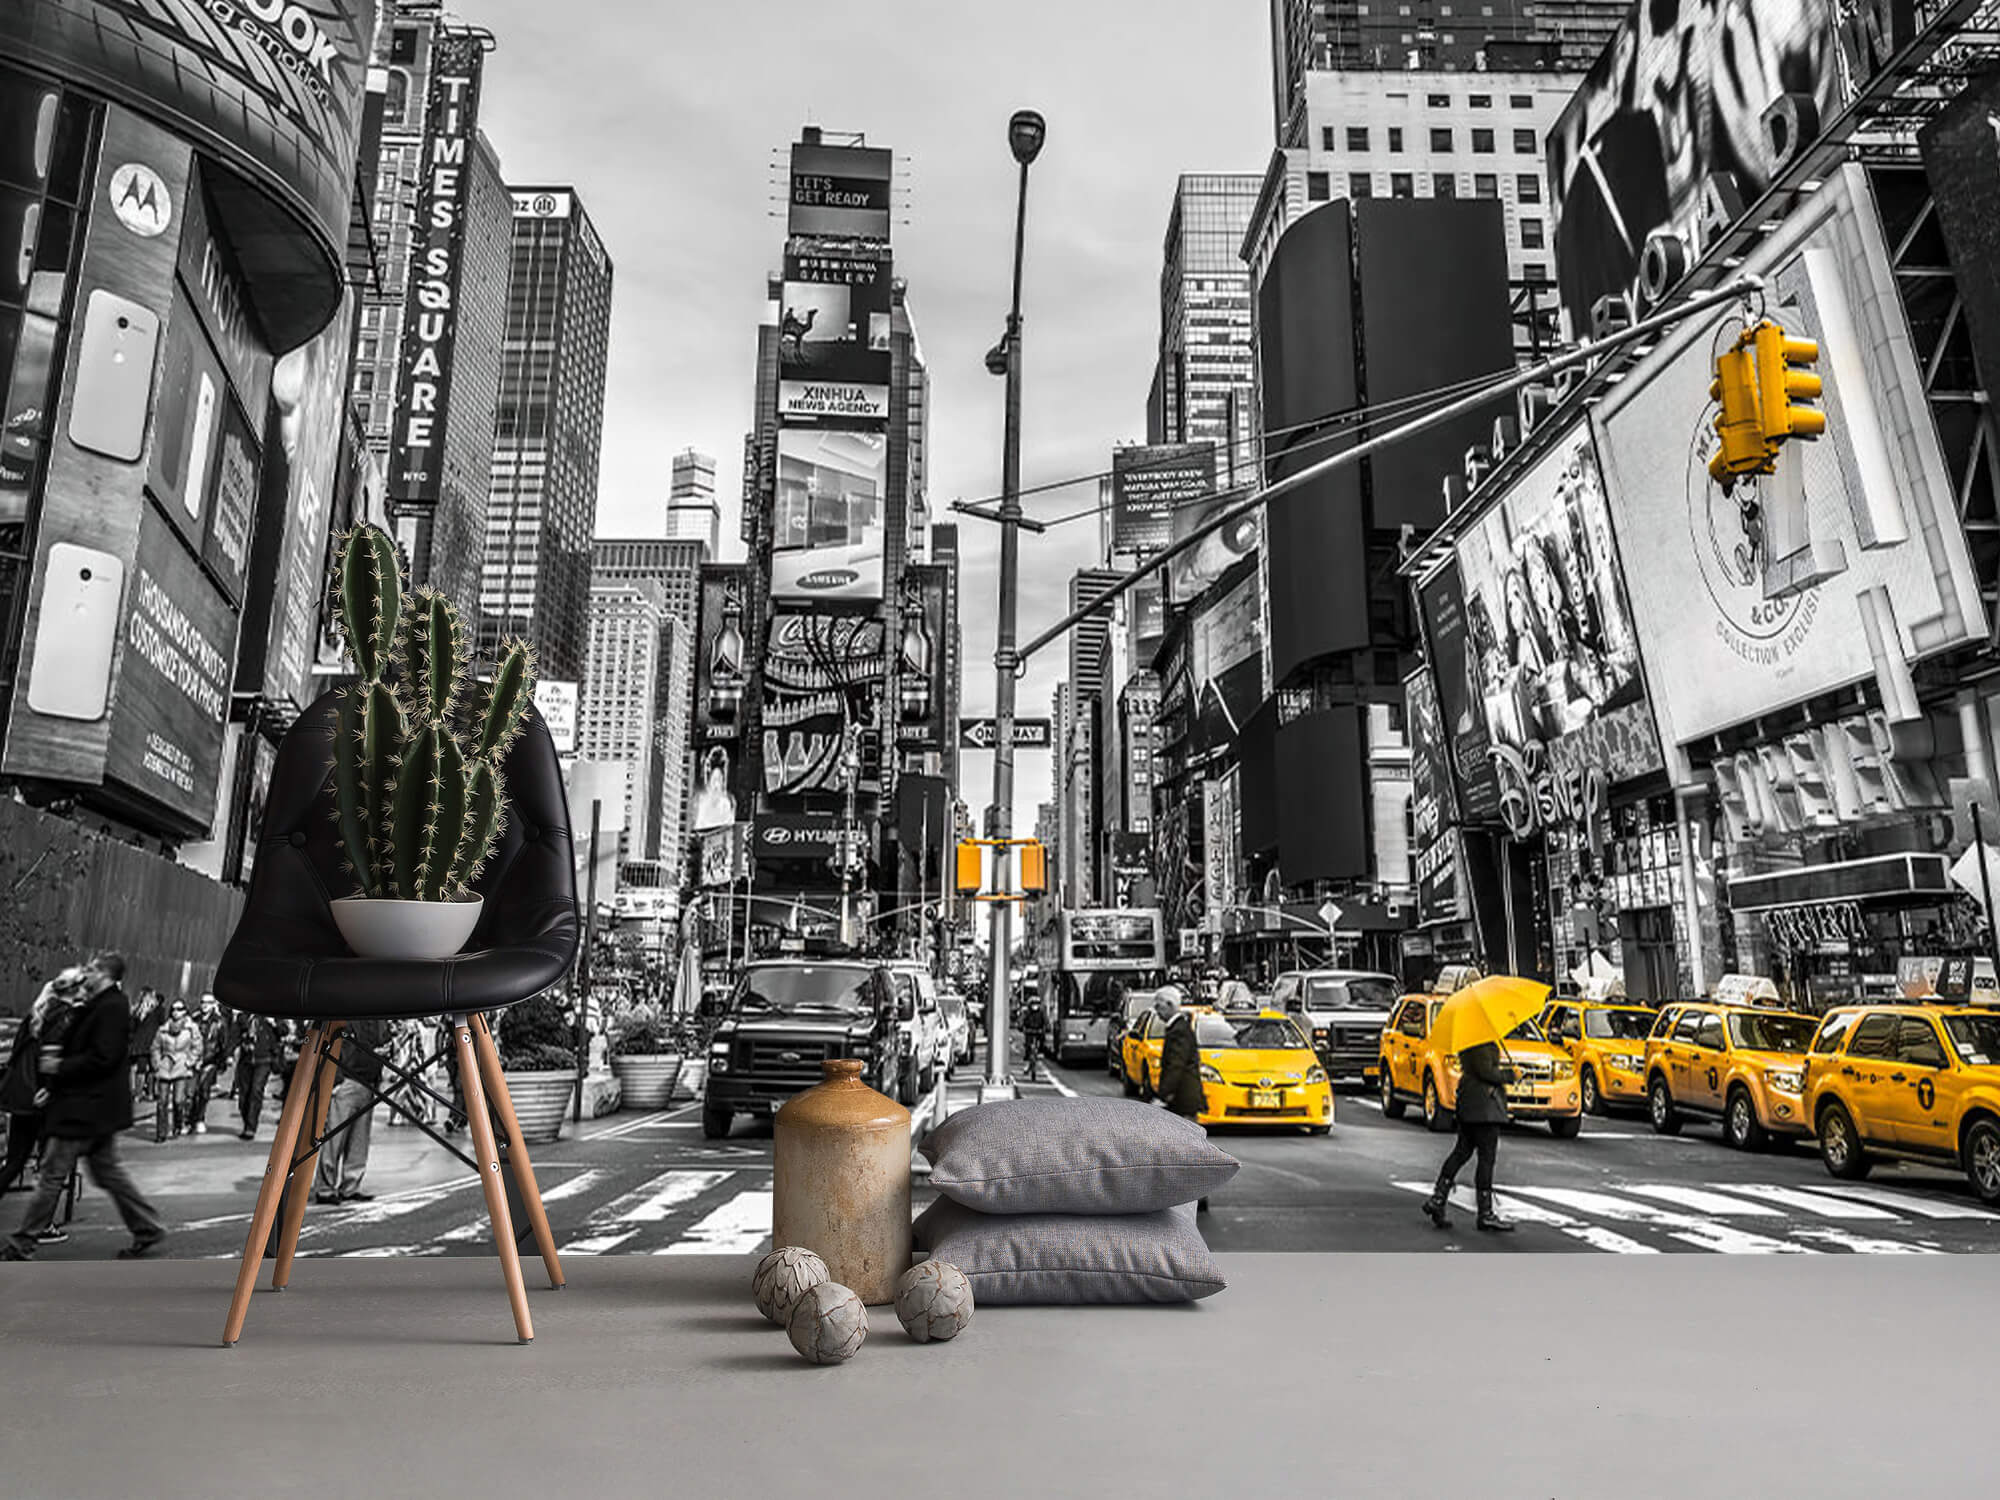 Broadway Times Square 10